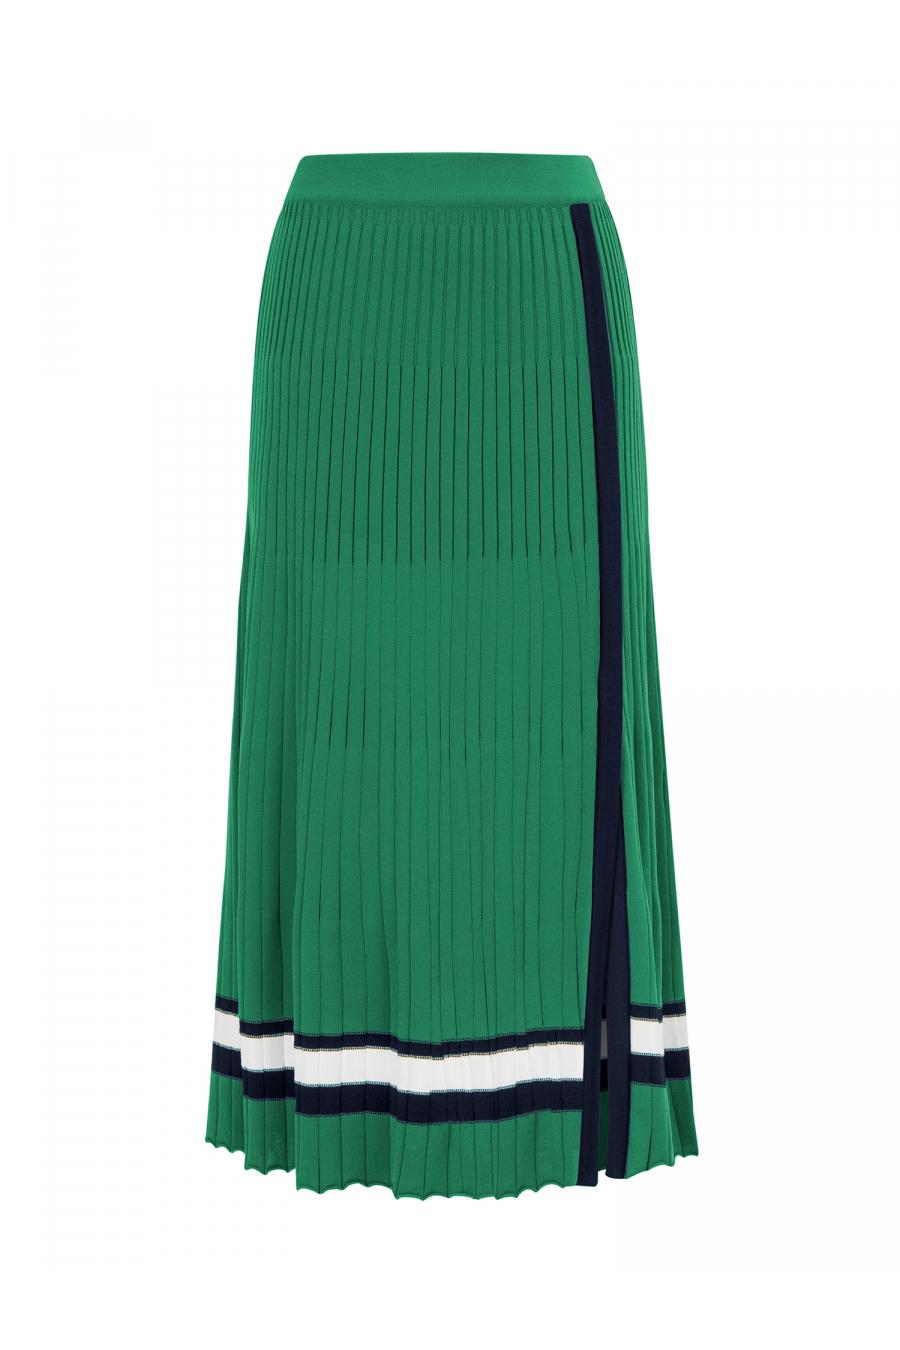 Strip Skirt Green